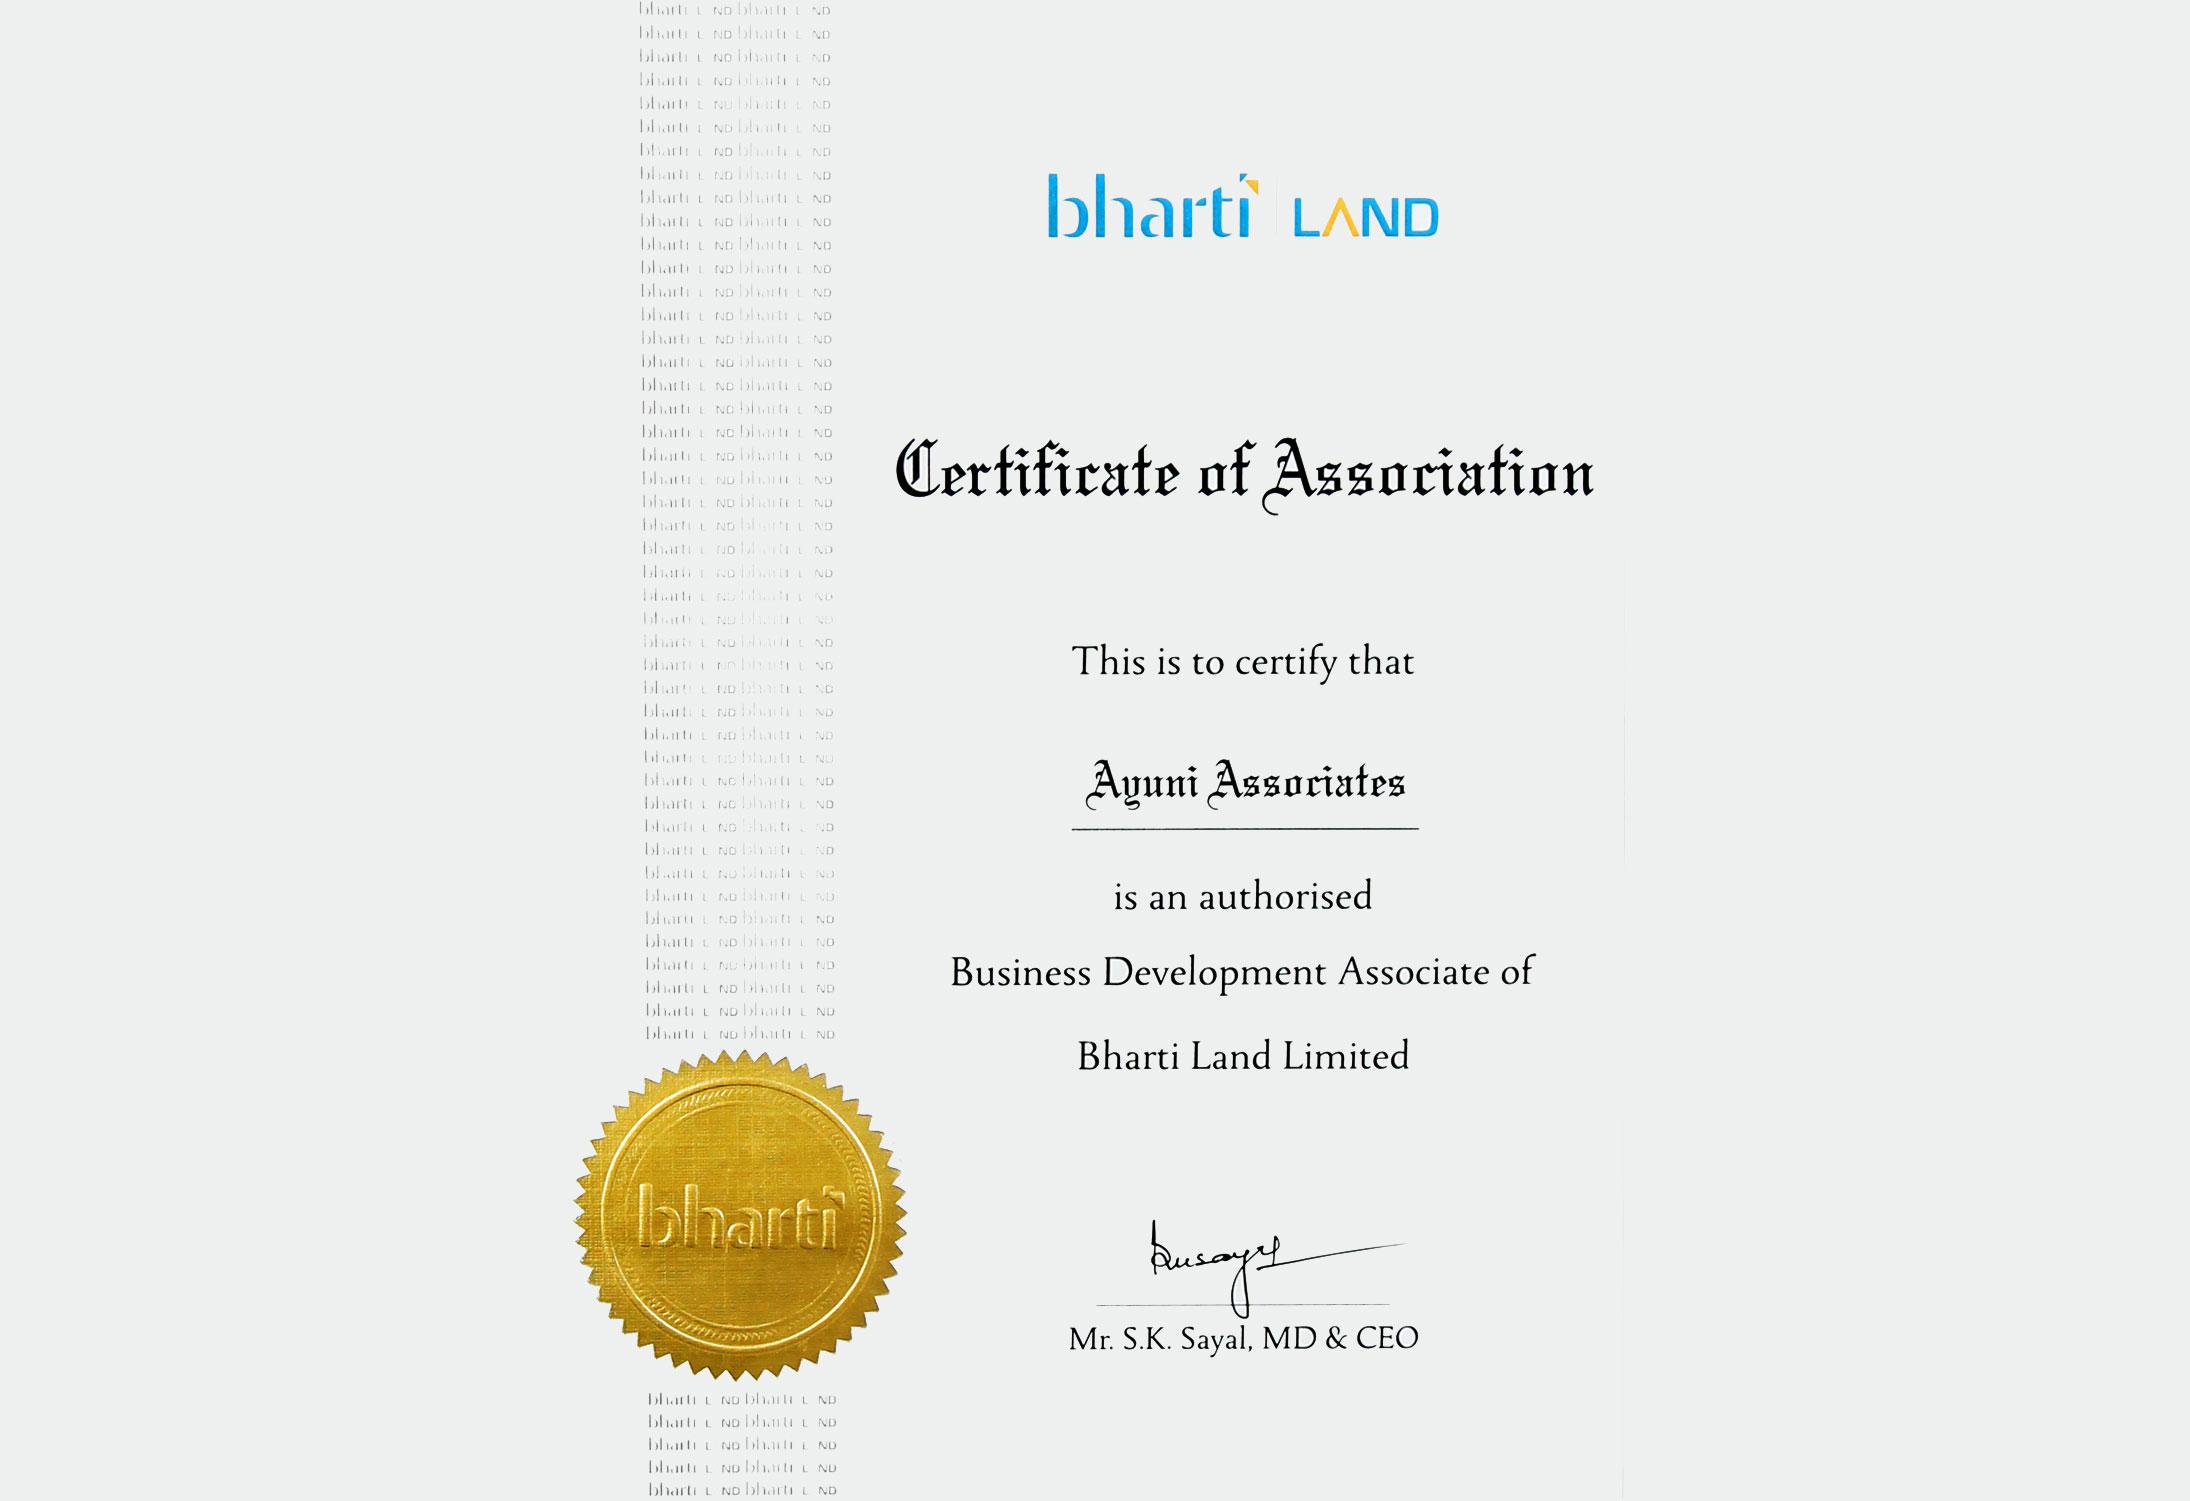 Bharti Land